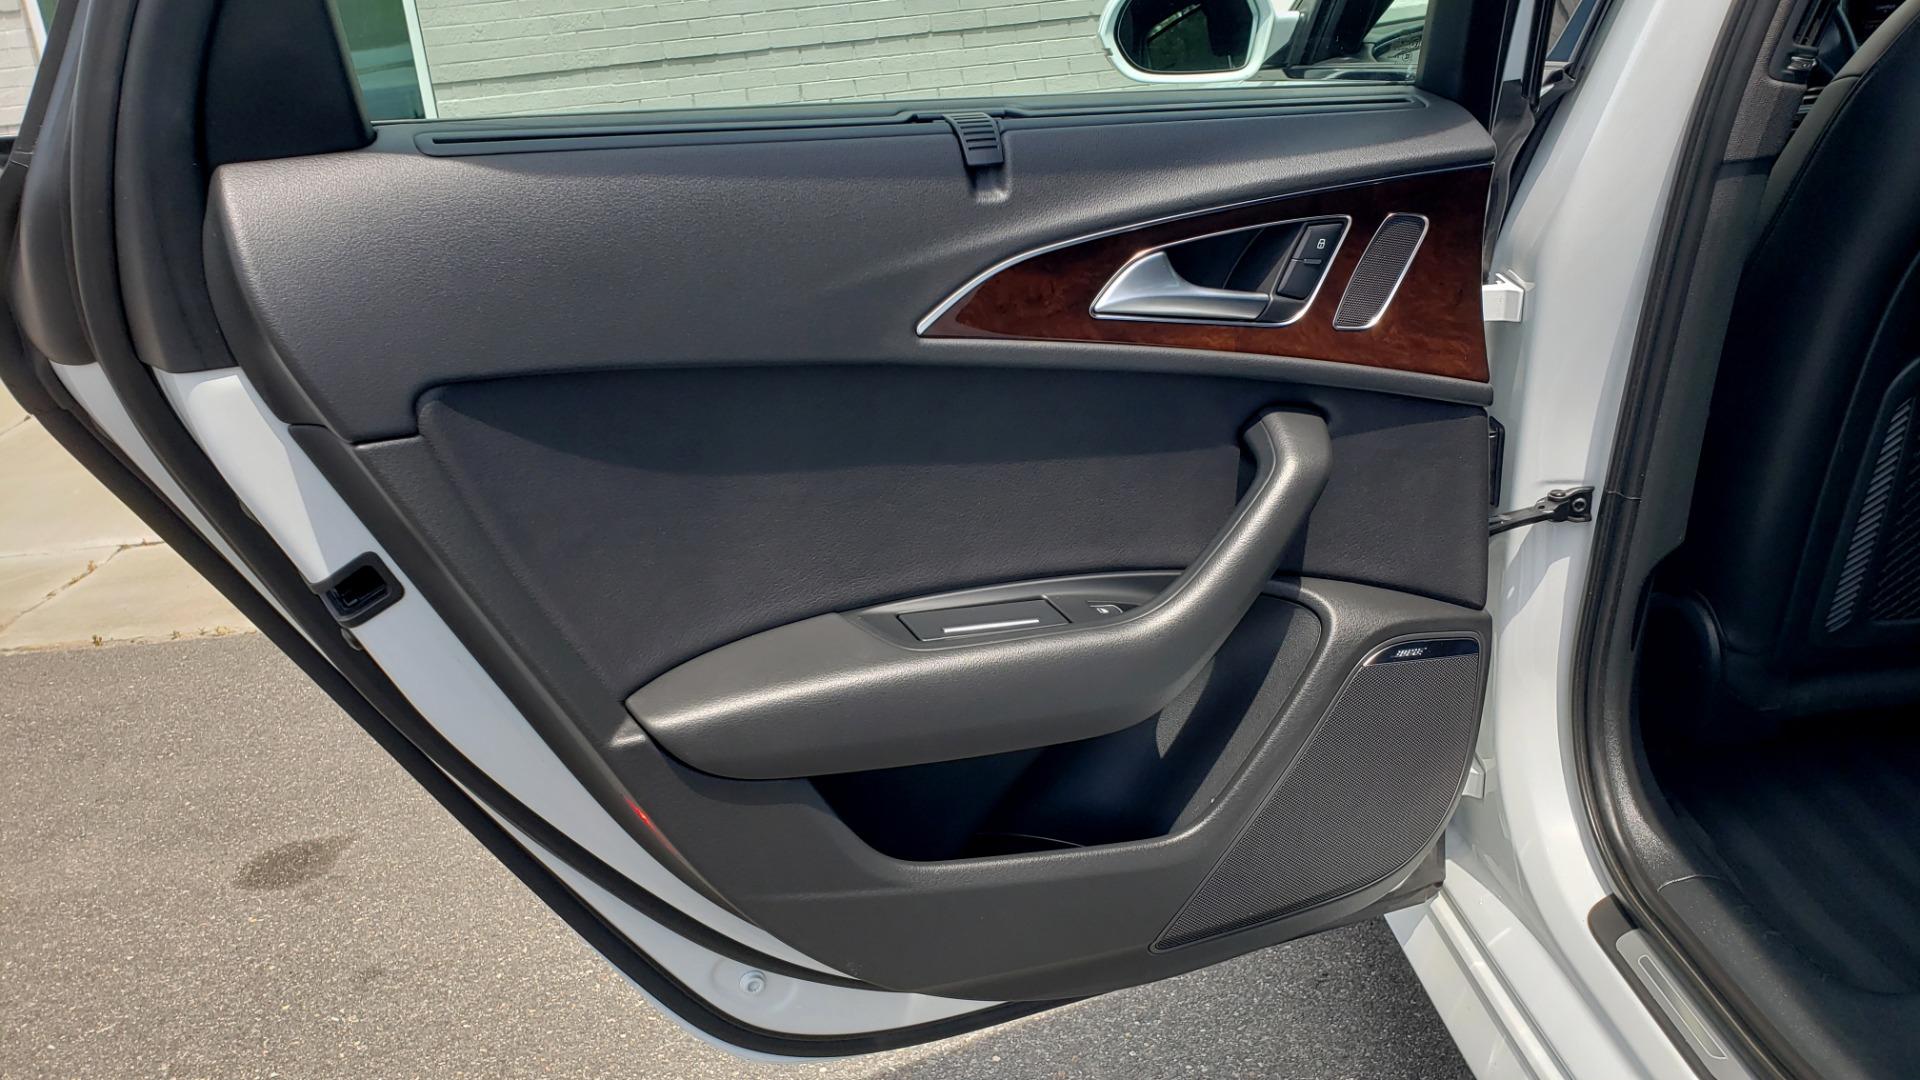 Used 2017 Audi A6 PRESTIGE SEDAN 3.0T / NAV / SUNROOF / BLACK OPTIC / CLD WTHR / REARVIEW for sale $30,797 at Formula Imports in Charlotte NC 28227 64